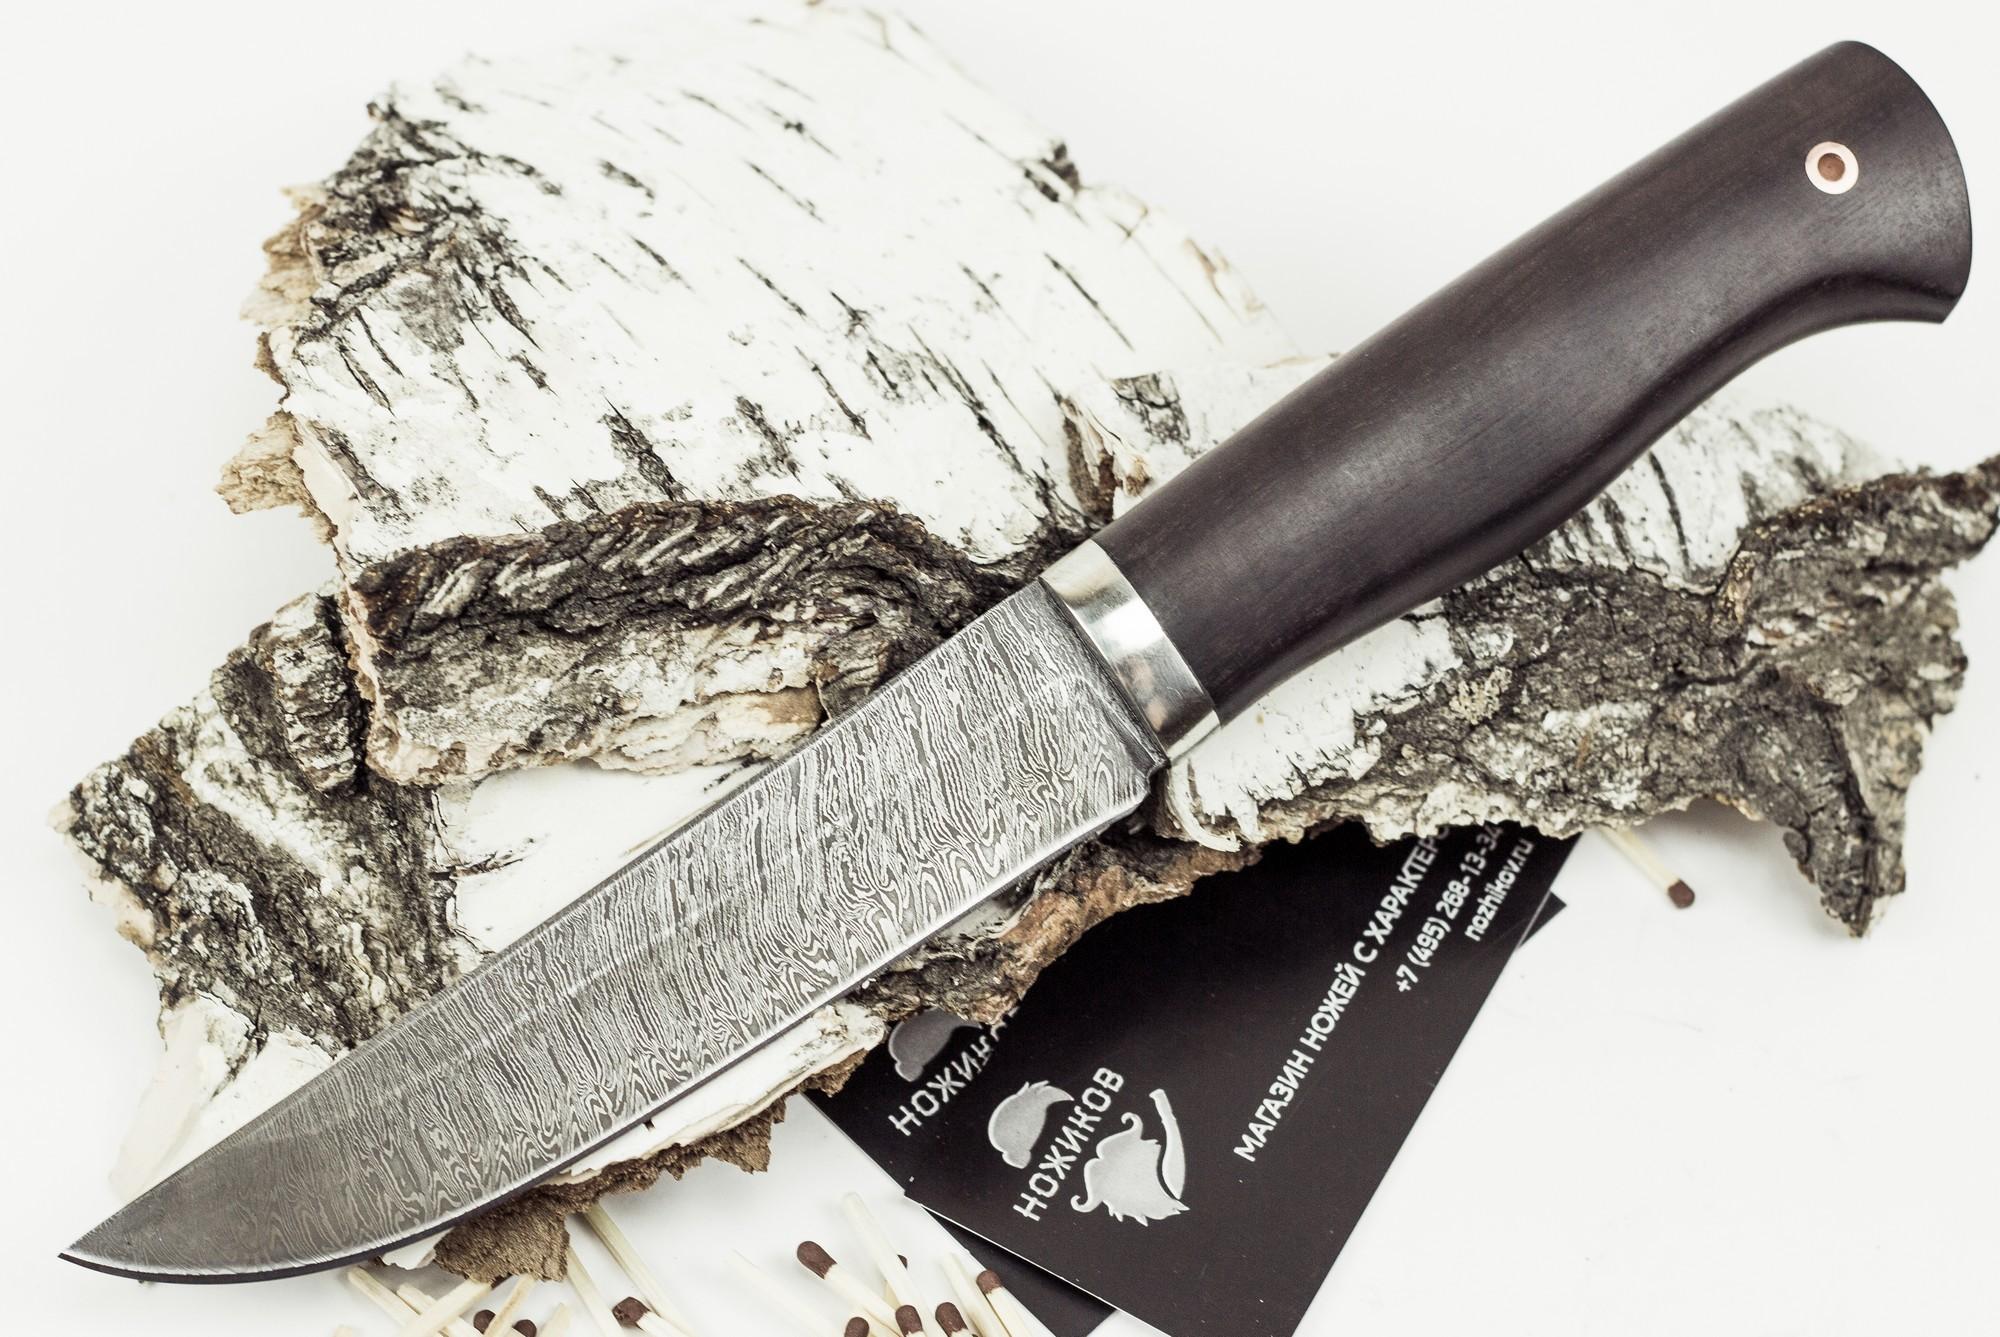 Нож Мангуст, дамасская стальНожи Ворсма<br>Нож Мангуст, дамасская сталь<br>